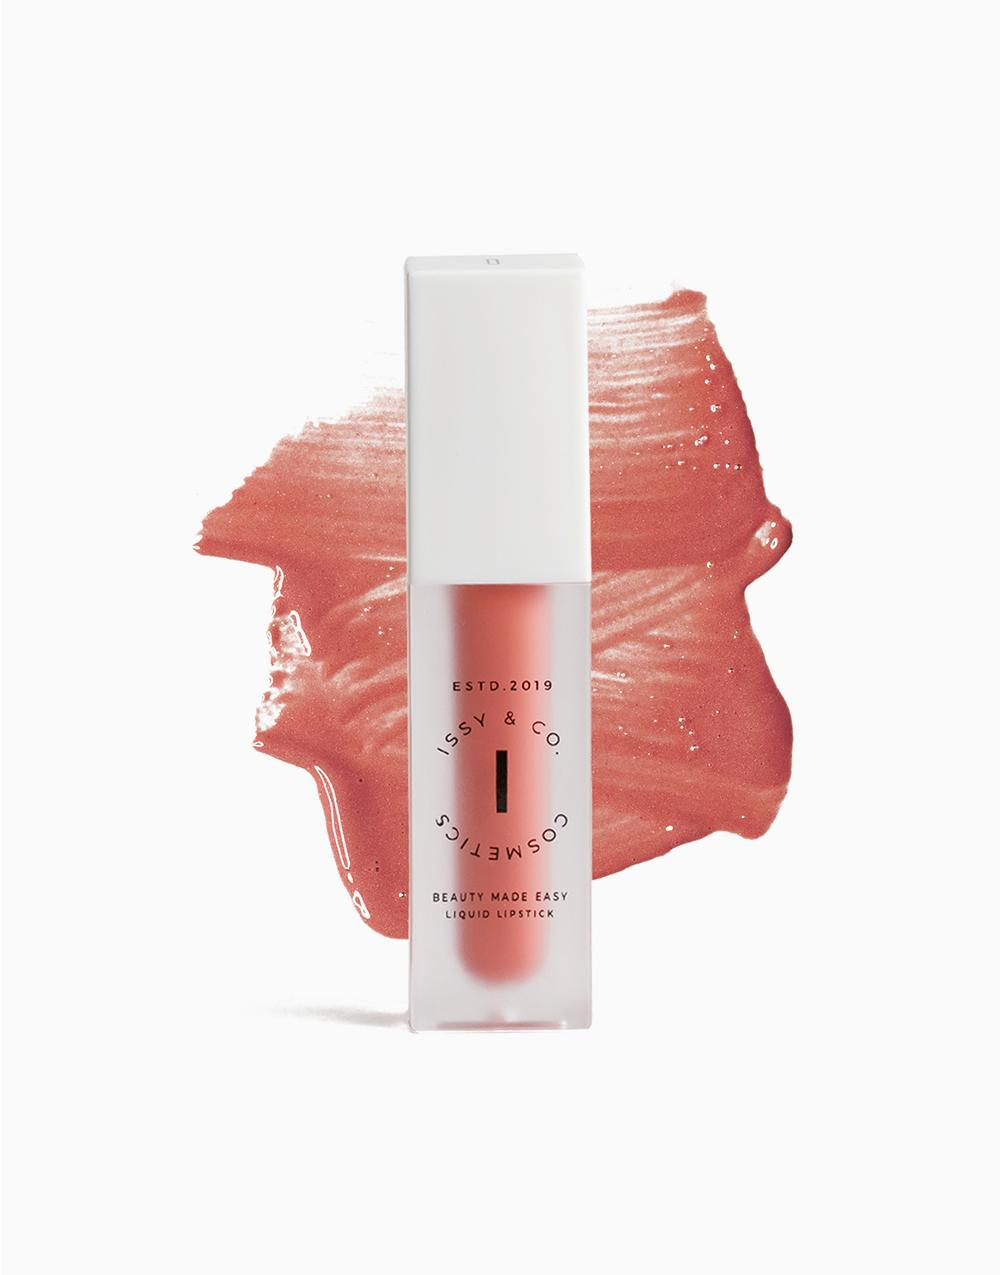 Liquid Lipstick by Issy & Co. | St. Tropez